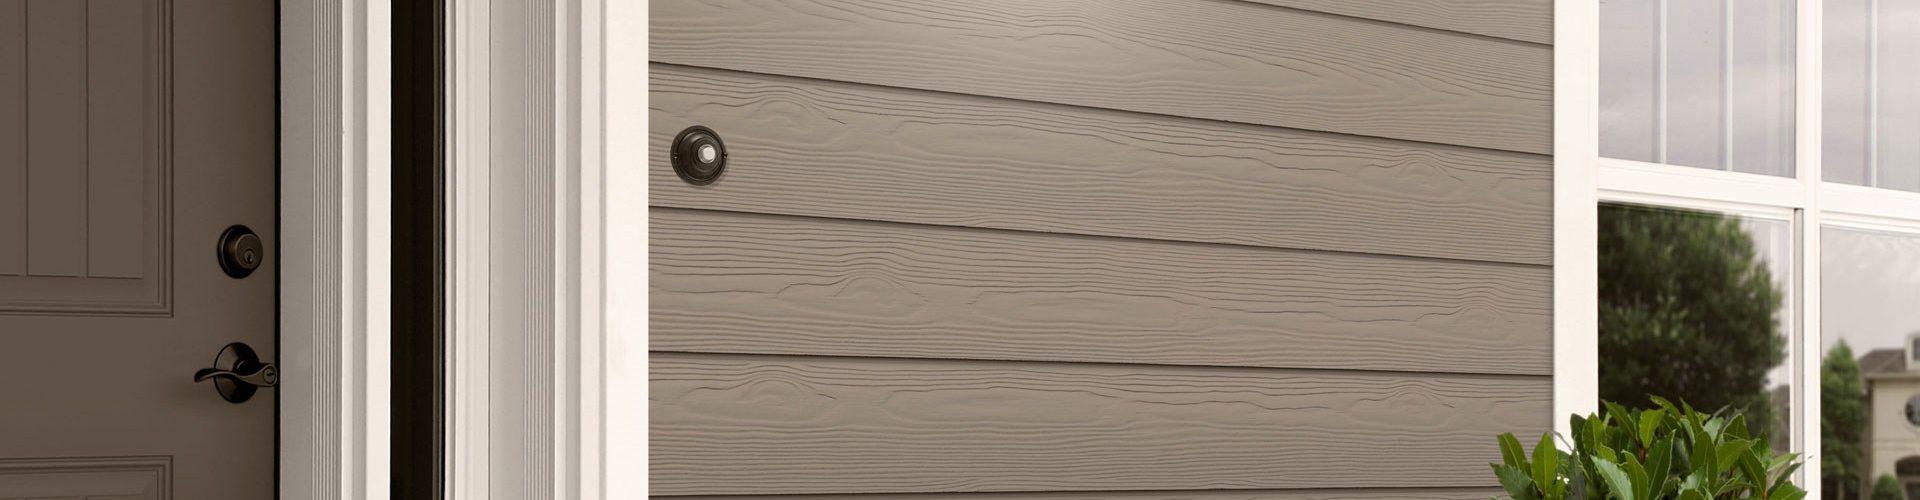 Cedral Classic C14 Savi - ülekattega puidumustriga voodrilaud